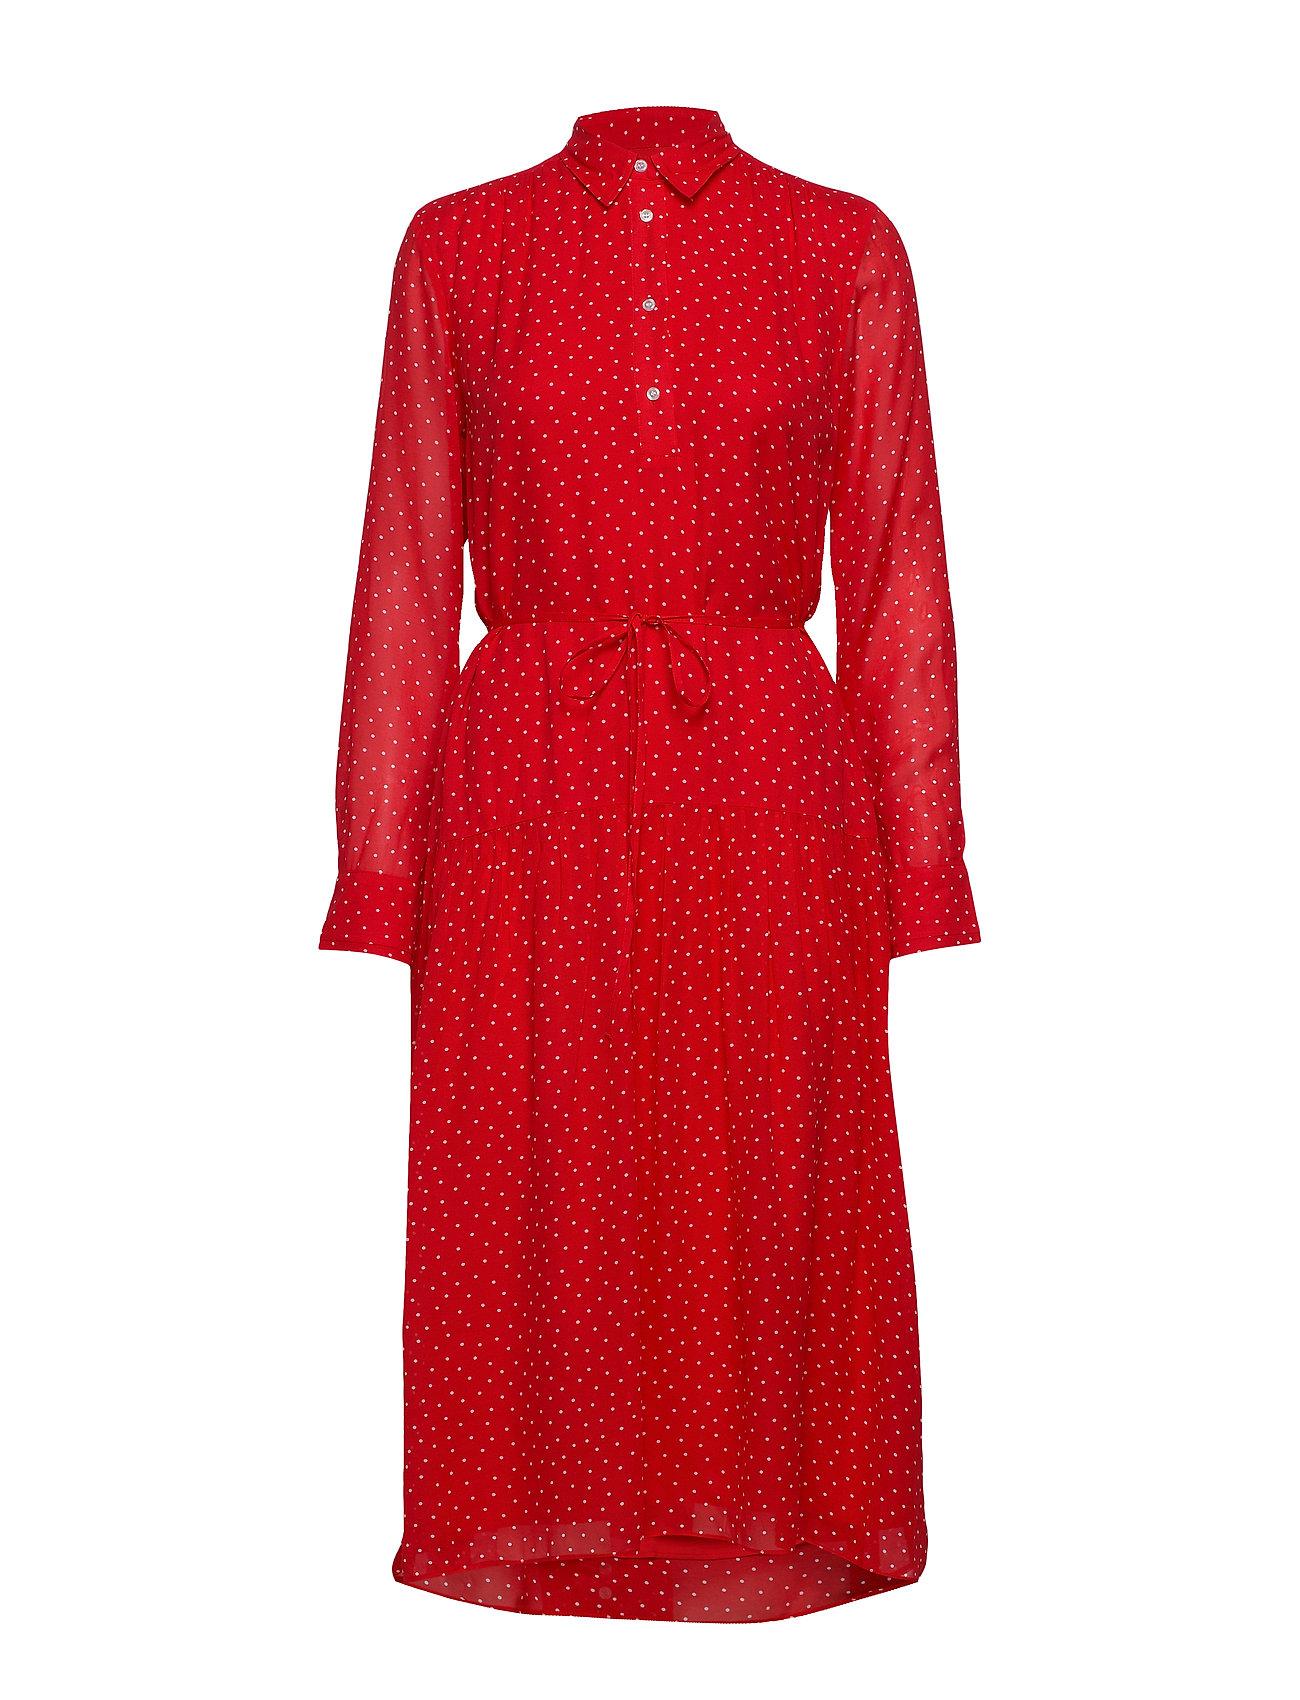 Gant D1. FRENCH DOT CHIFFON DRESS - BRIGHT RED